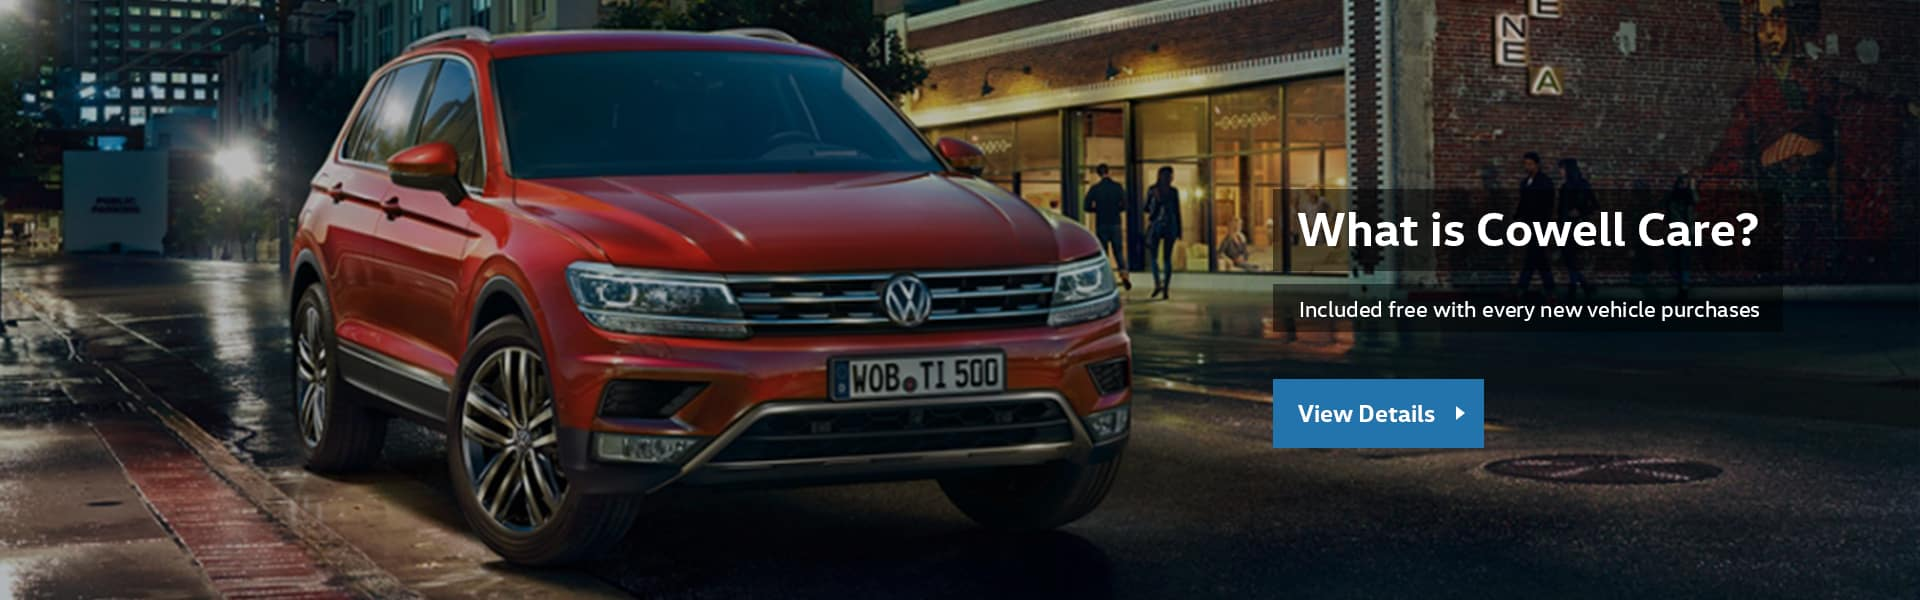 Cowell Volkswagen Vw Dealership In Richmond Bc